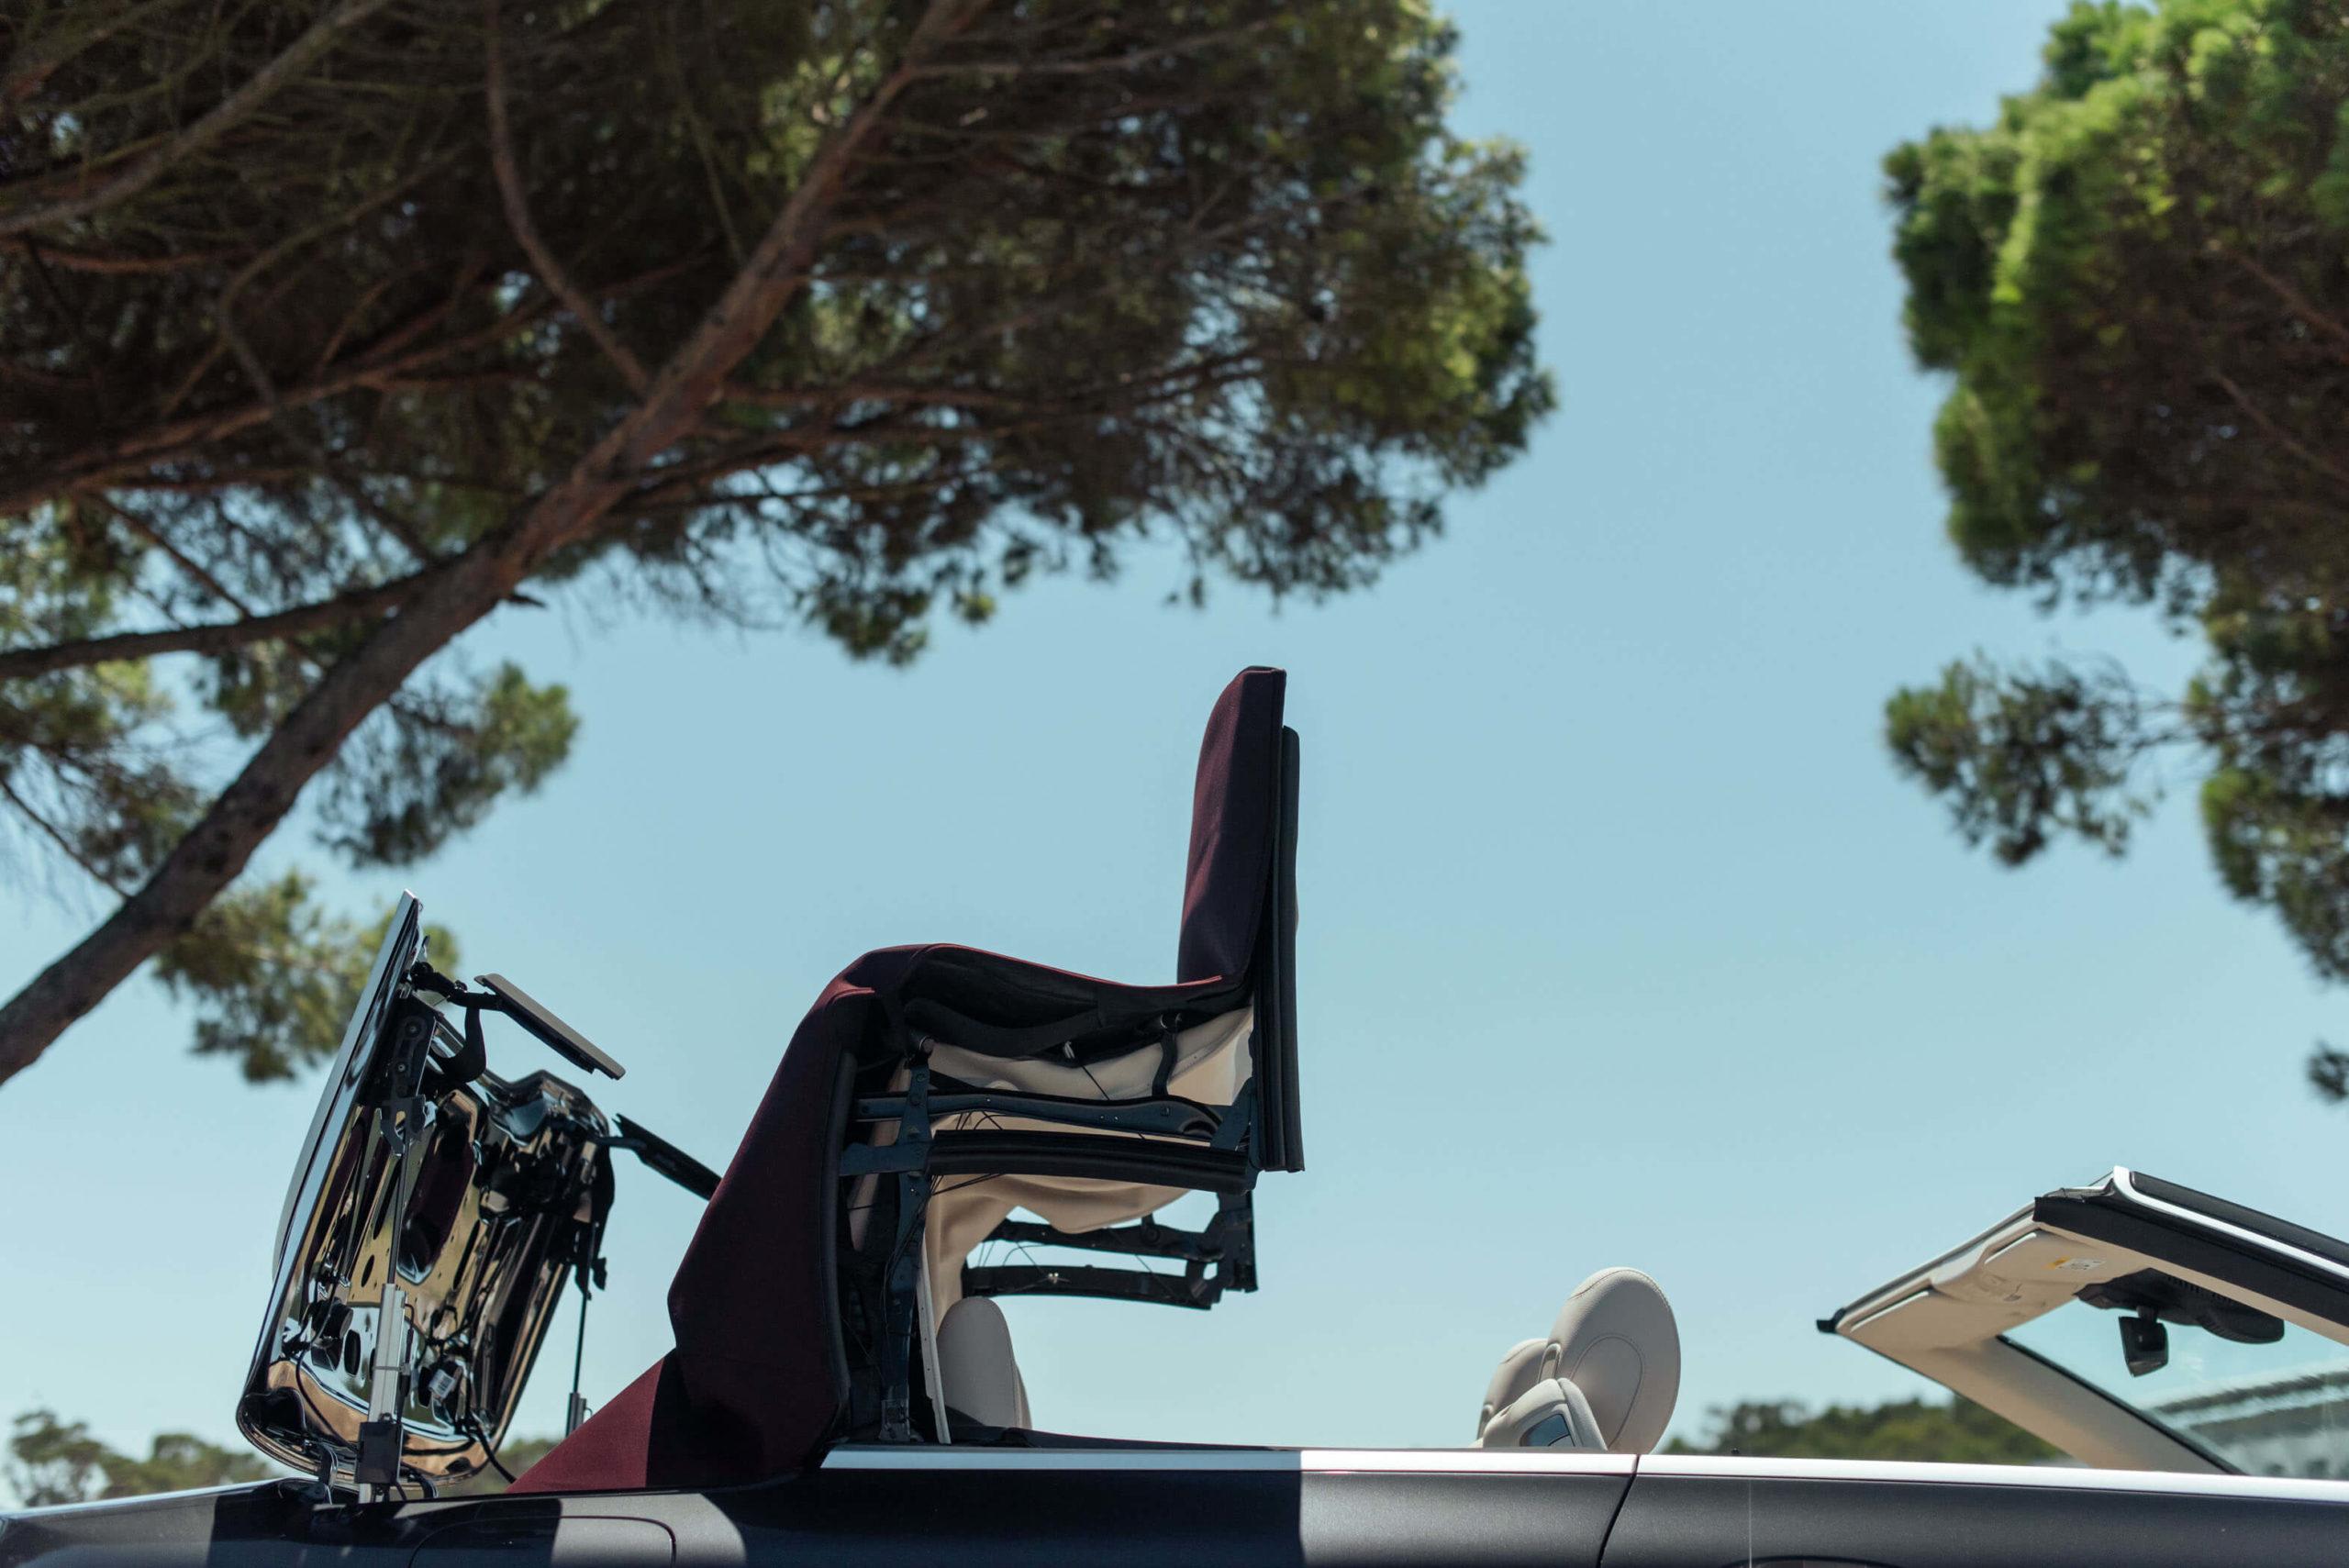 Capota Mercedes-Benz Classe E Cabriolet